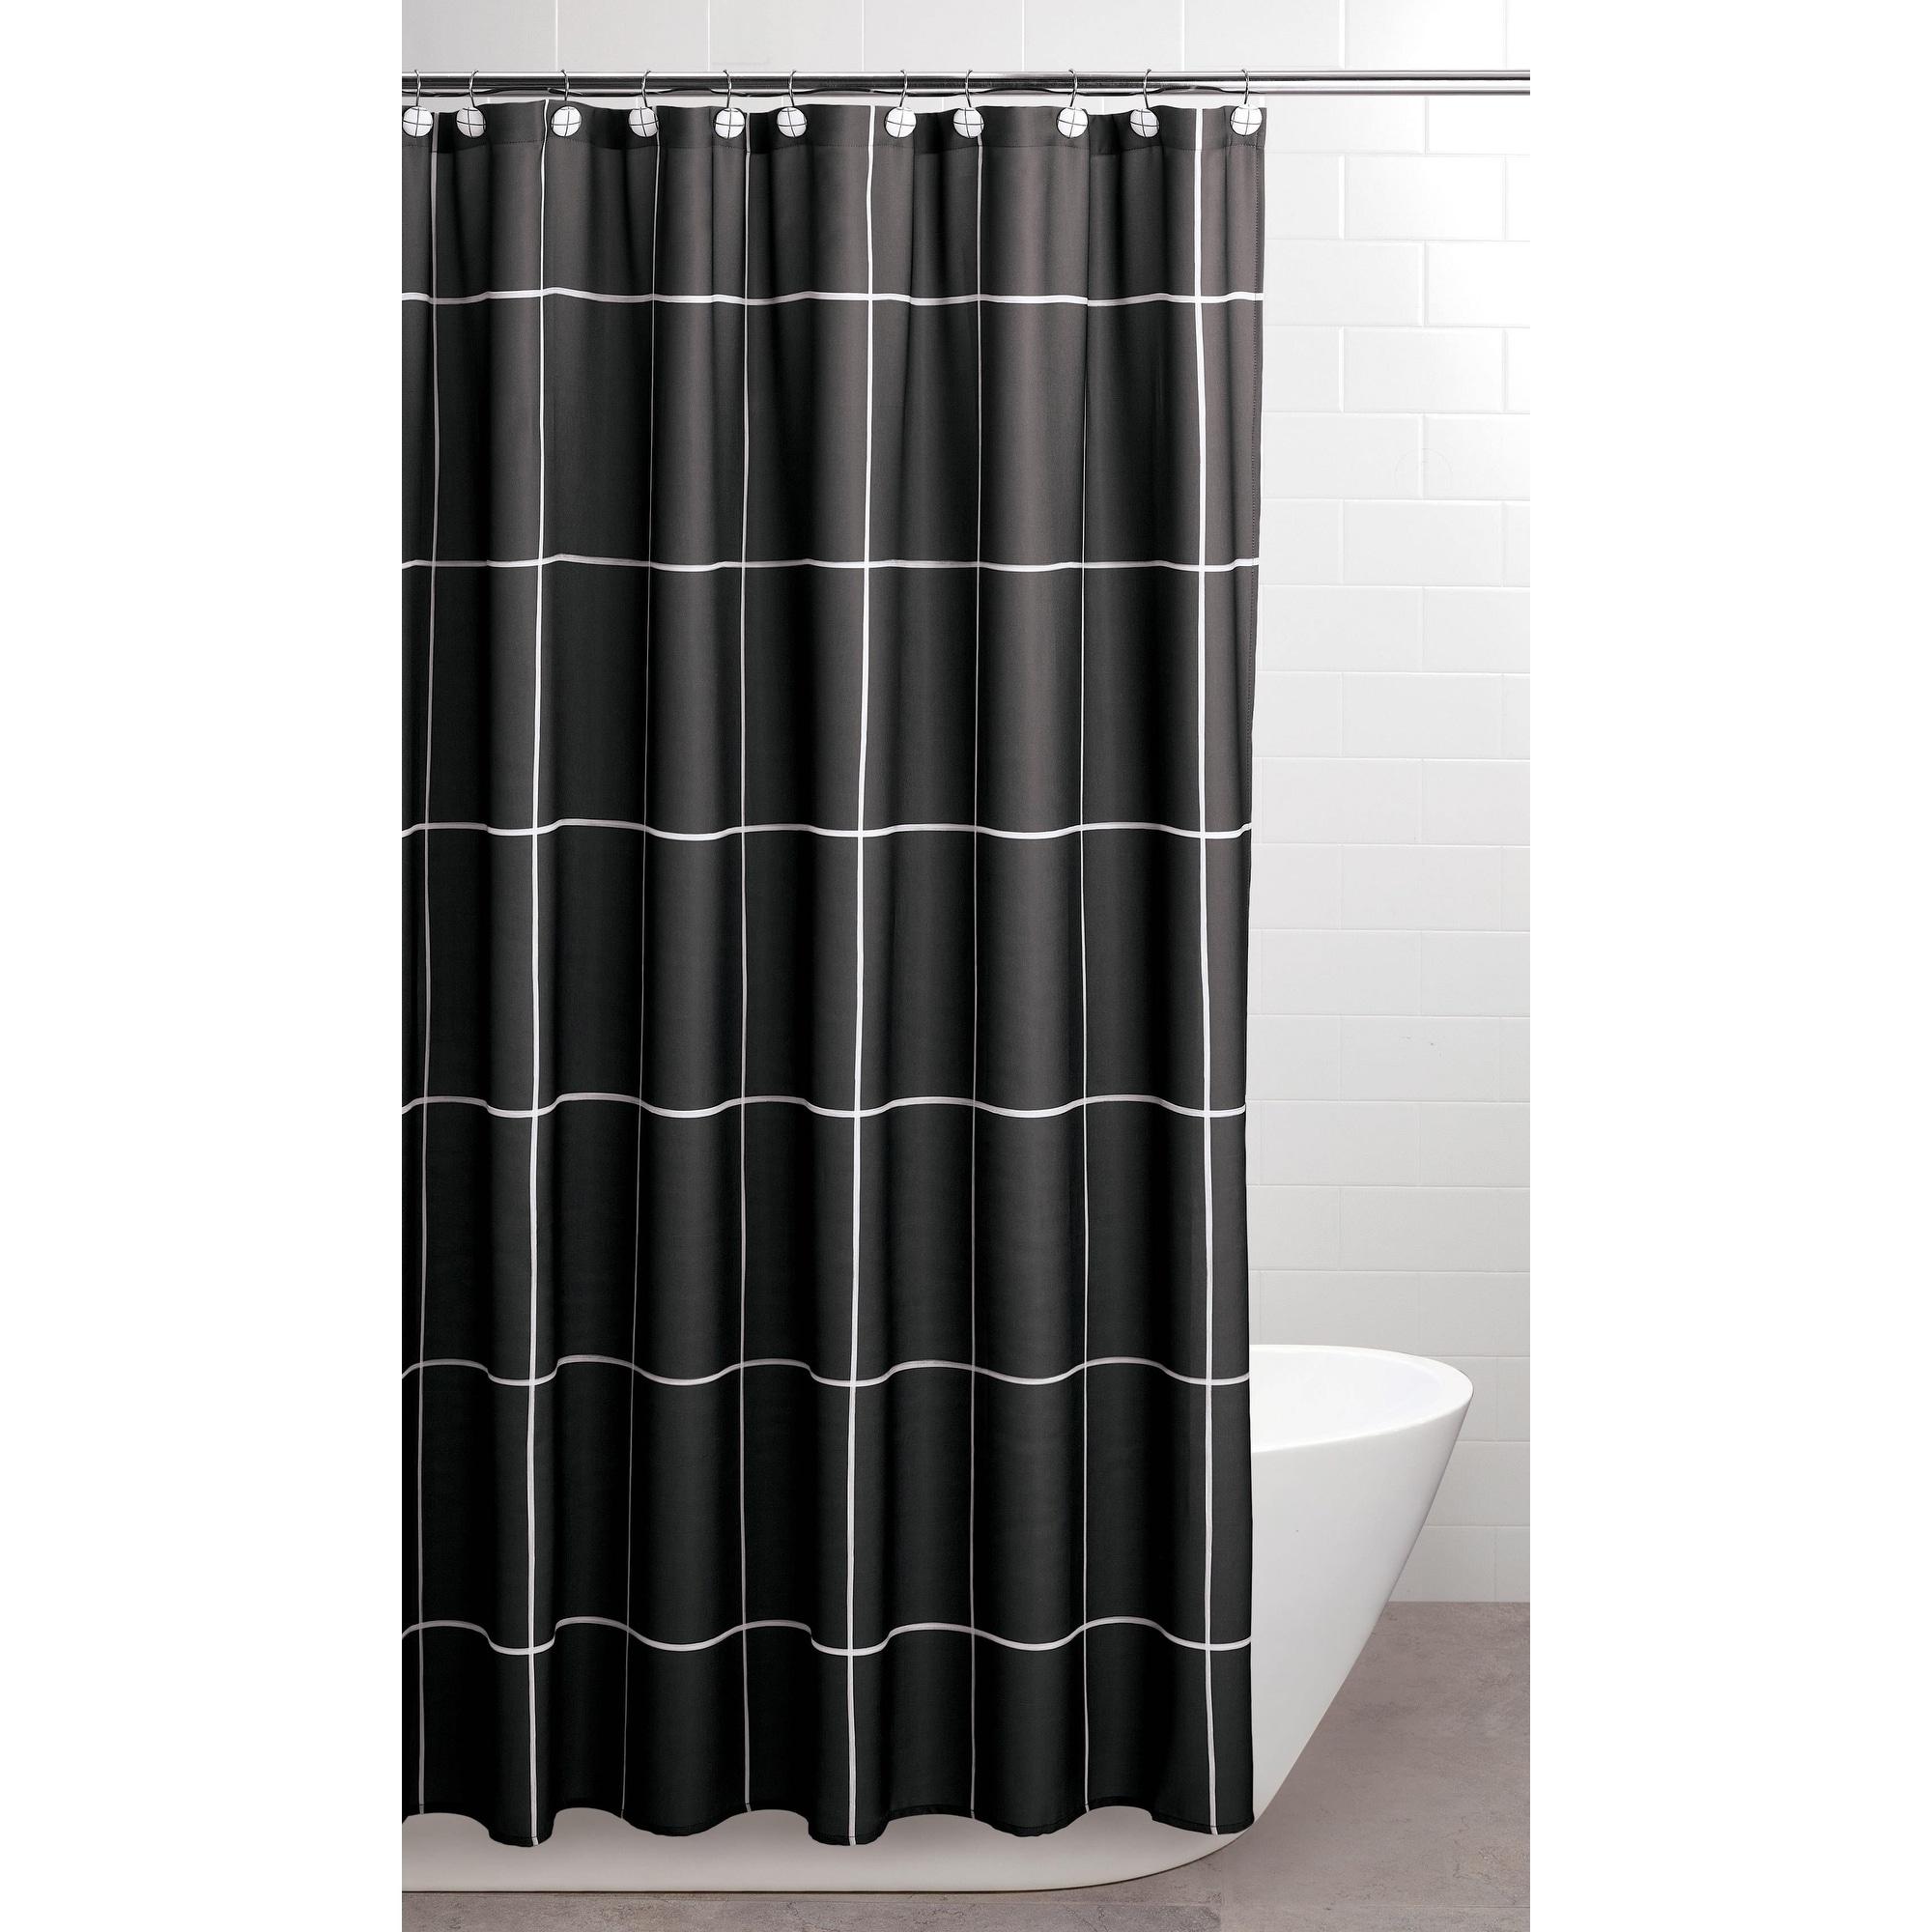 Sparrowhawk Brandon Twill Black/White Shower Curtain With Coordinating  Hook, 13 Piece Set